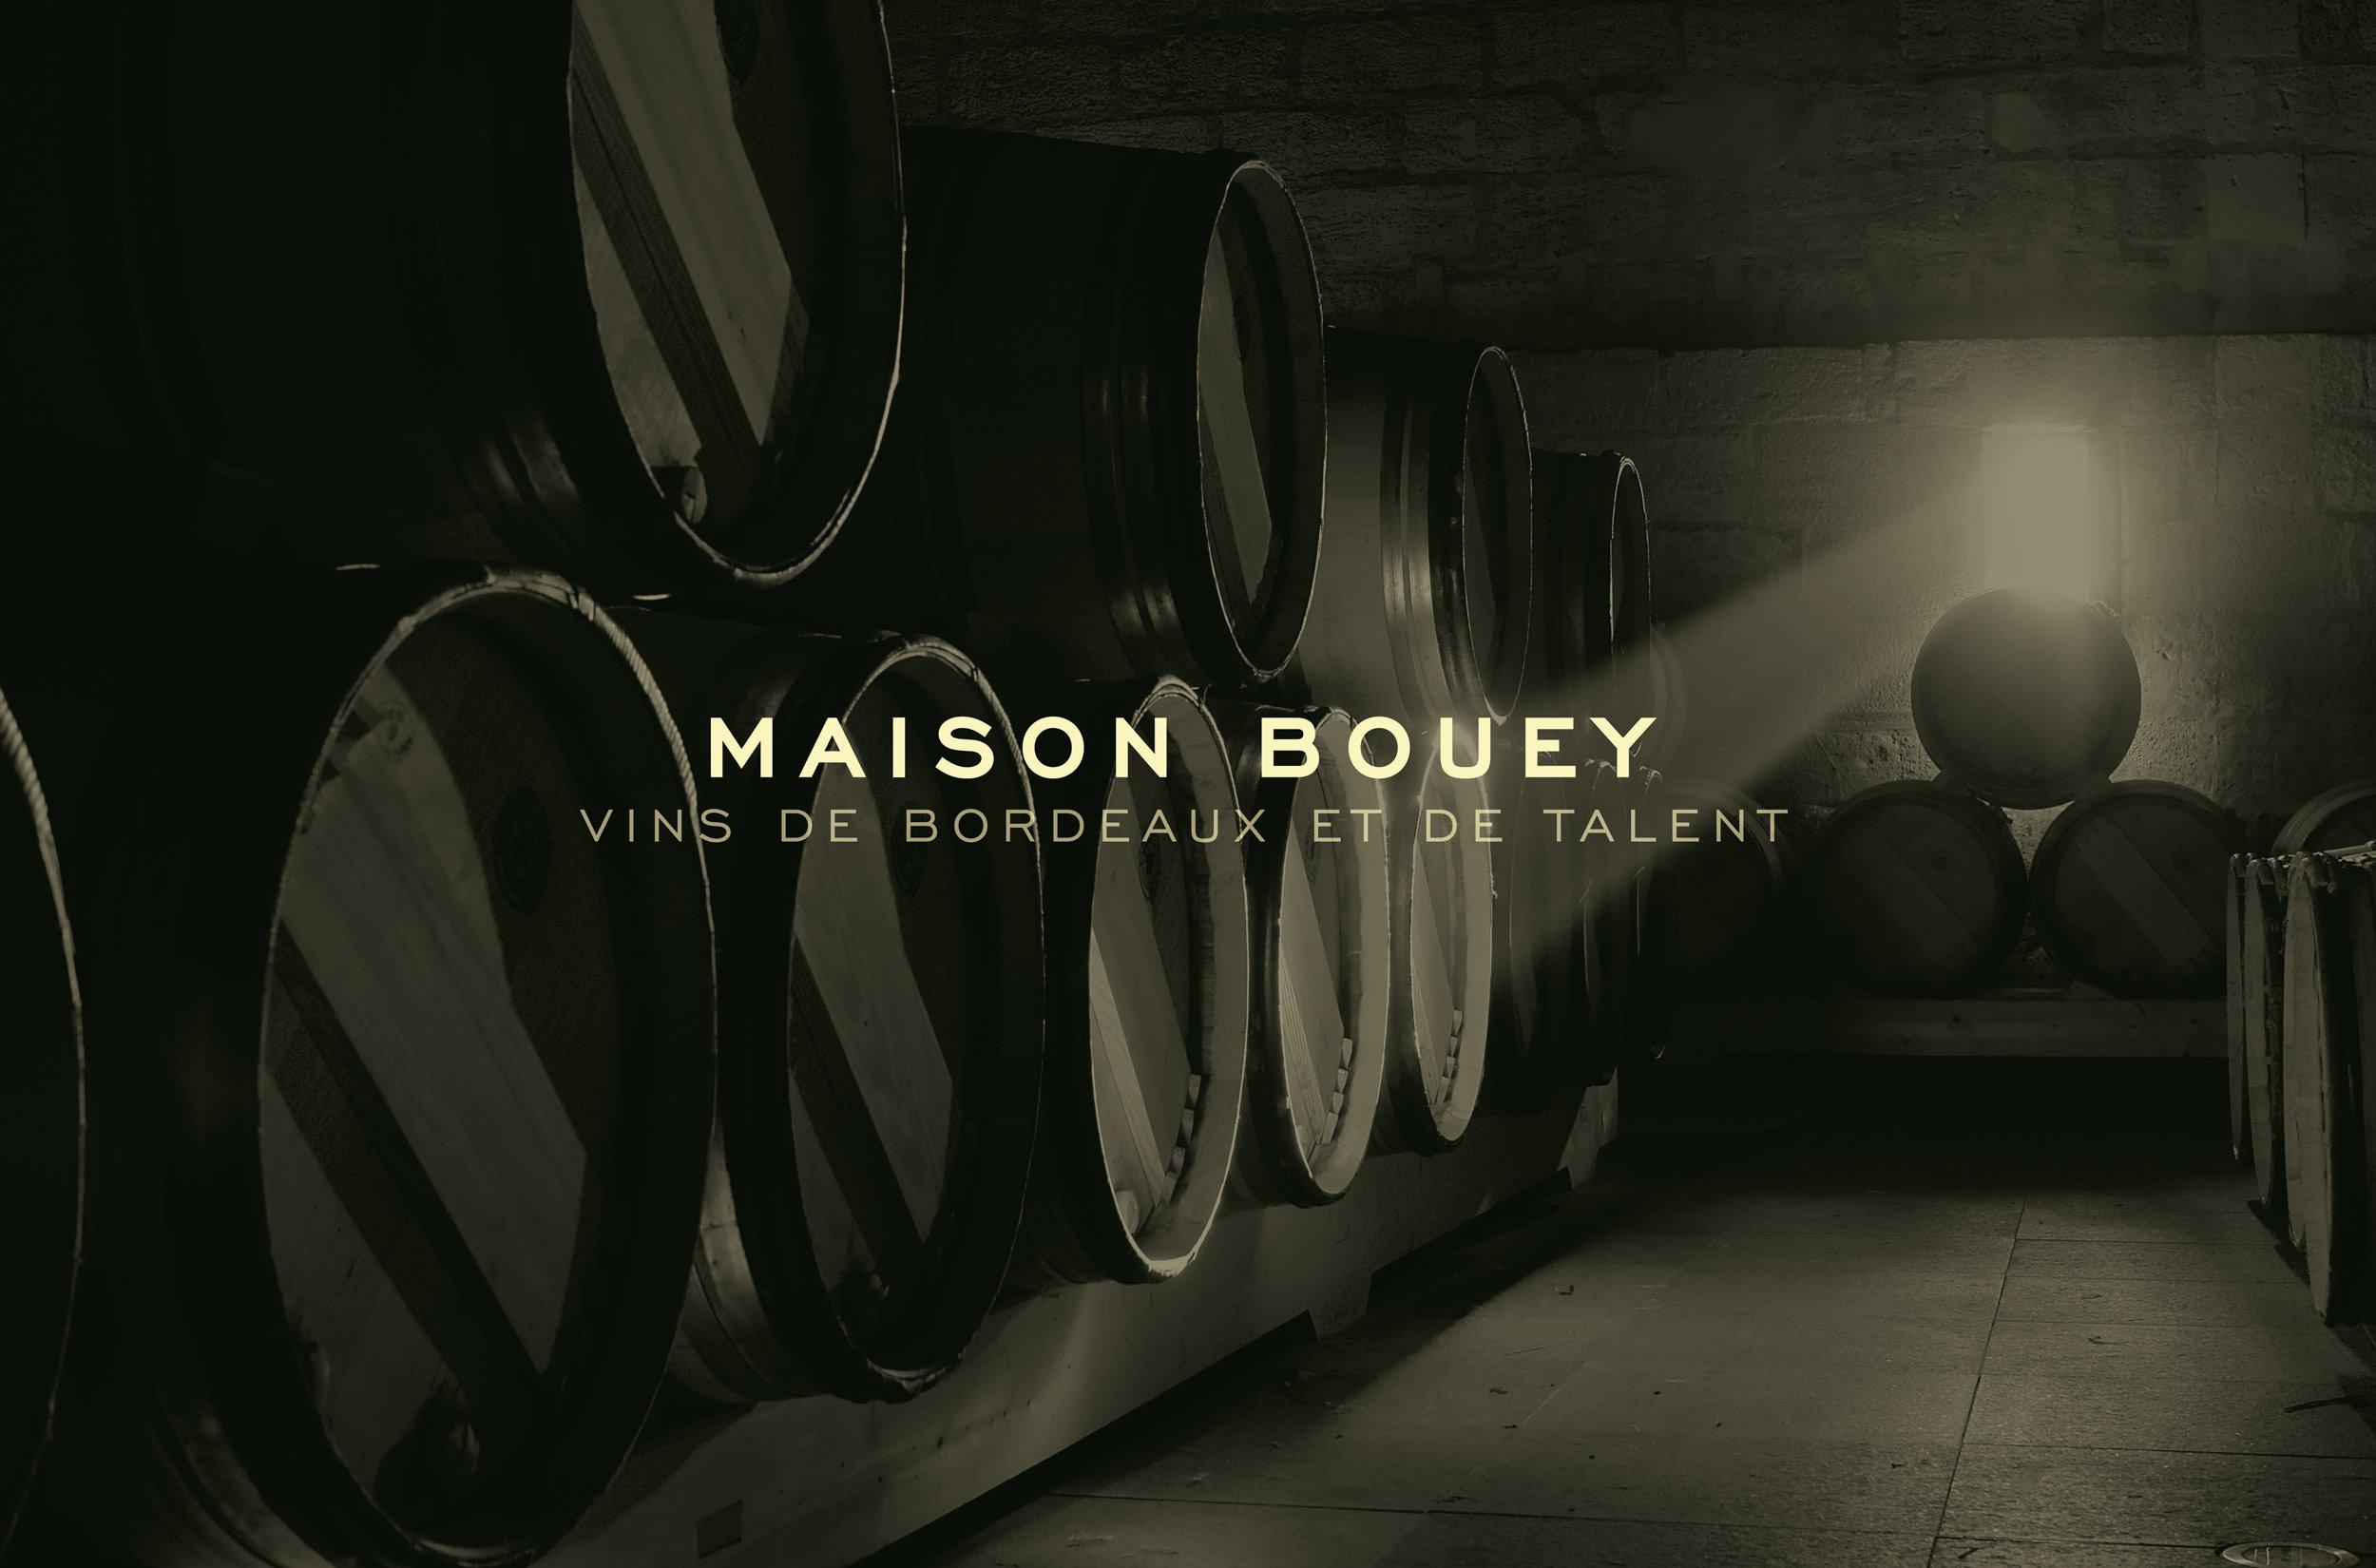 Maison Bouey - 1